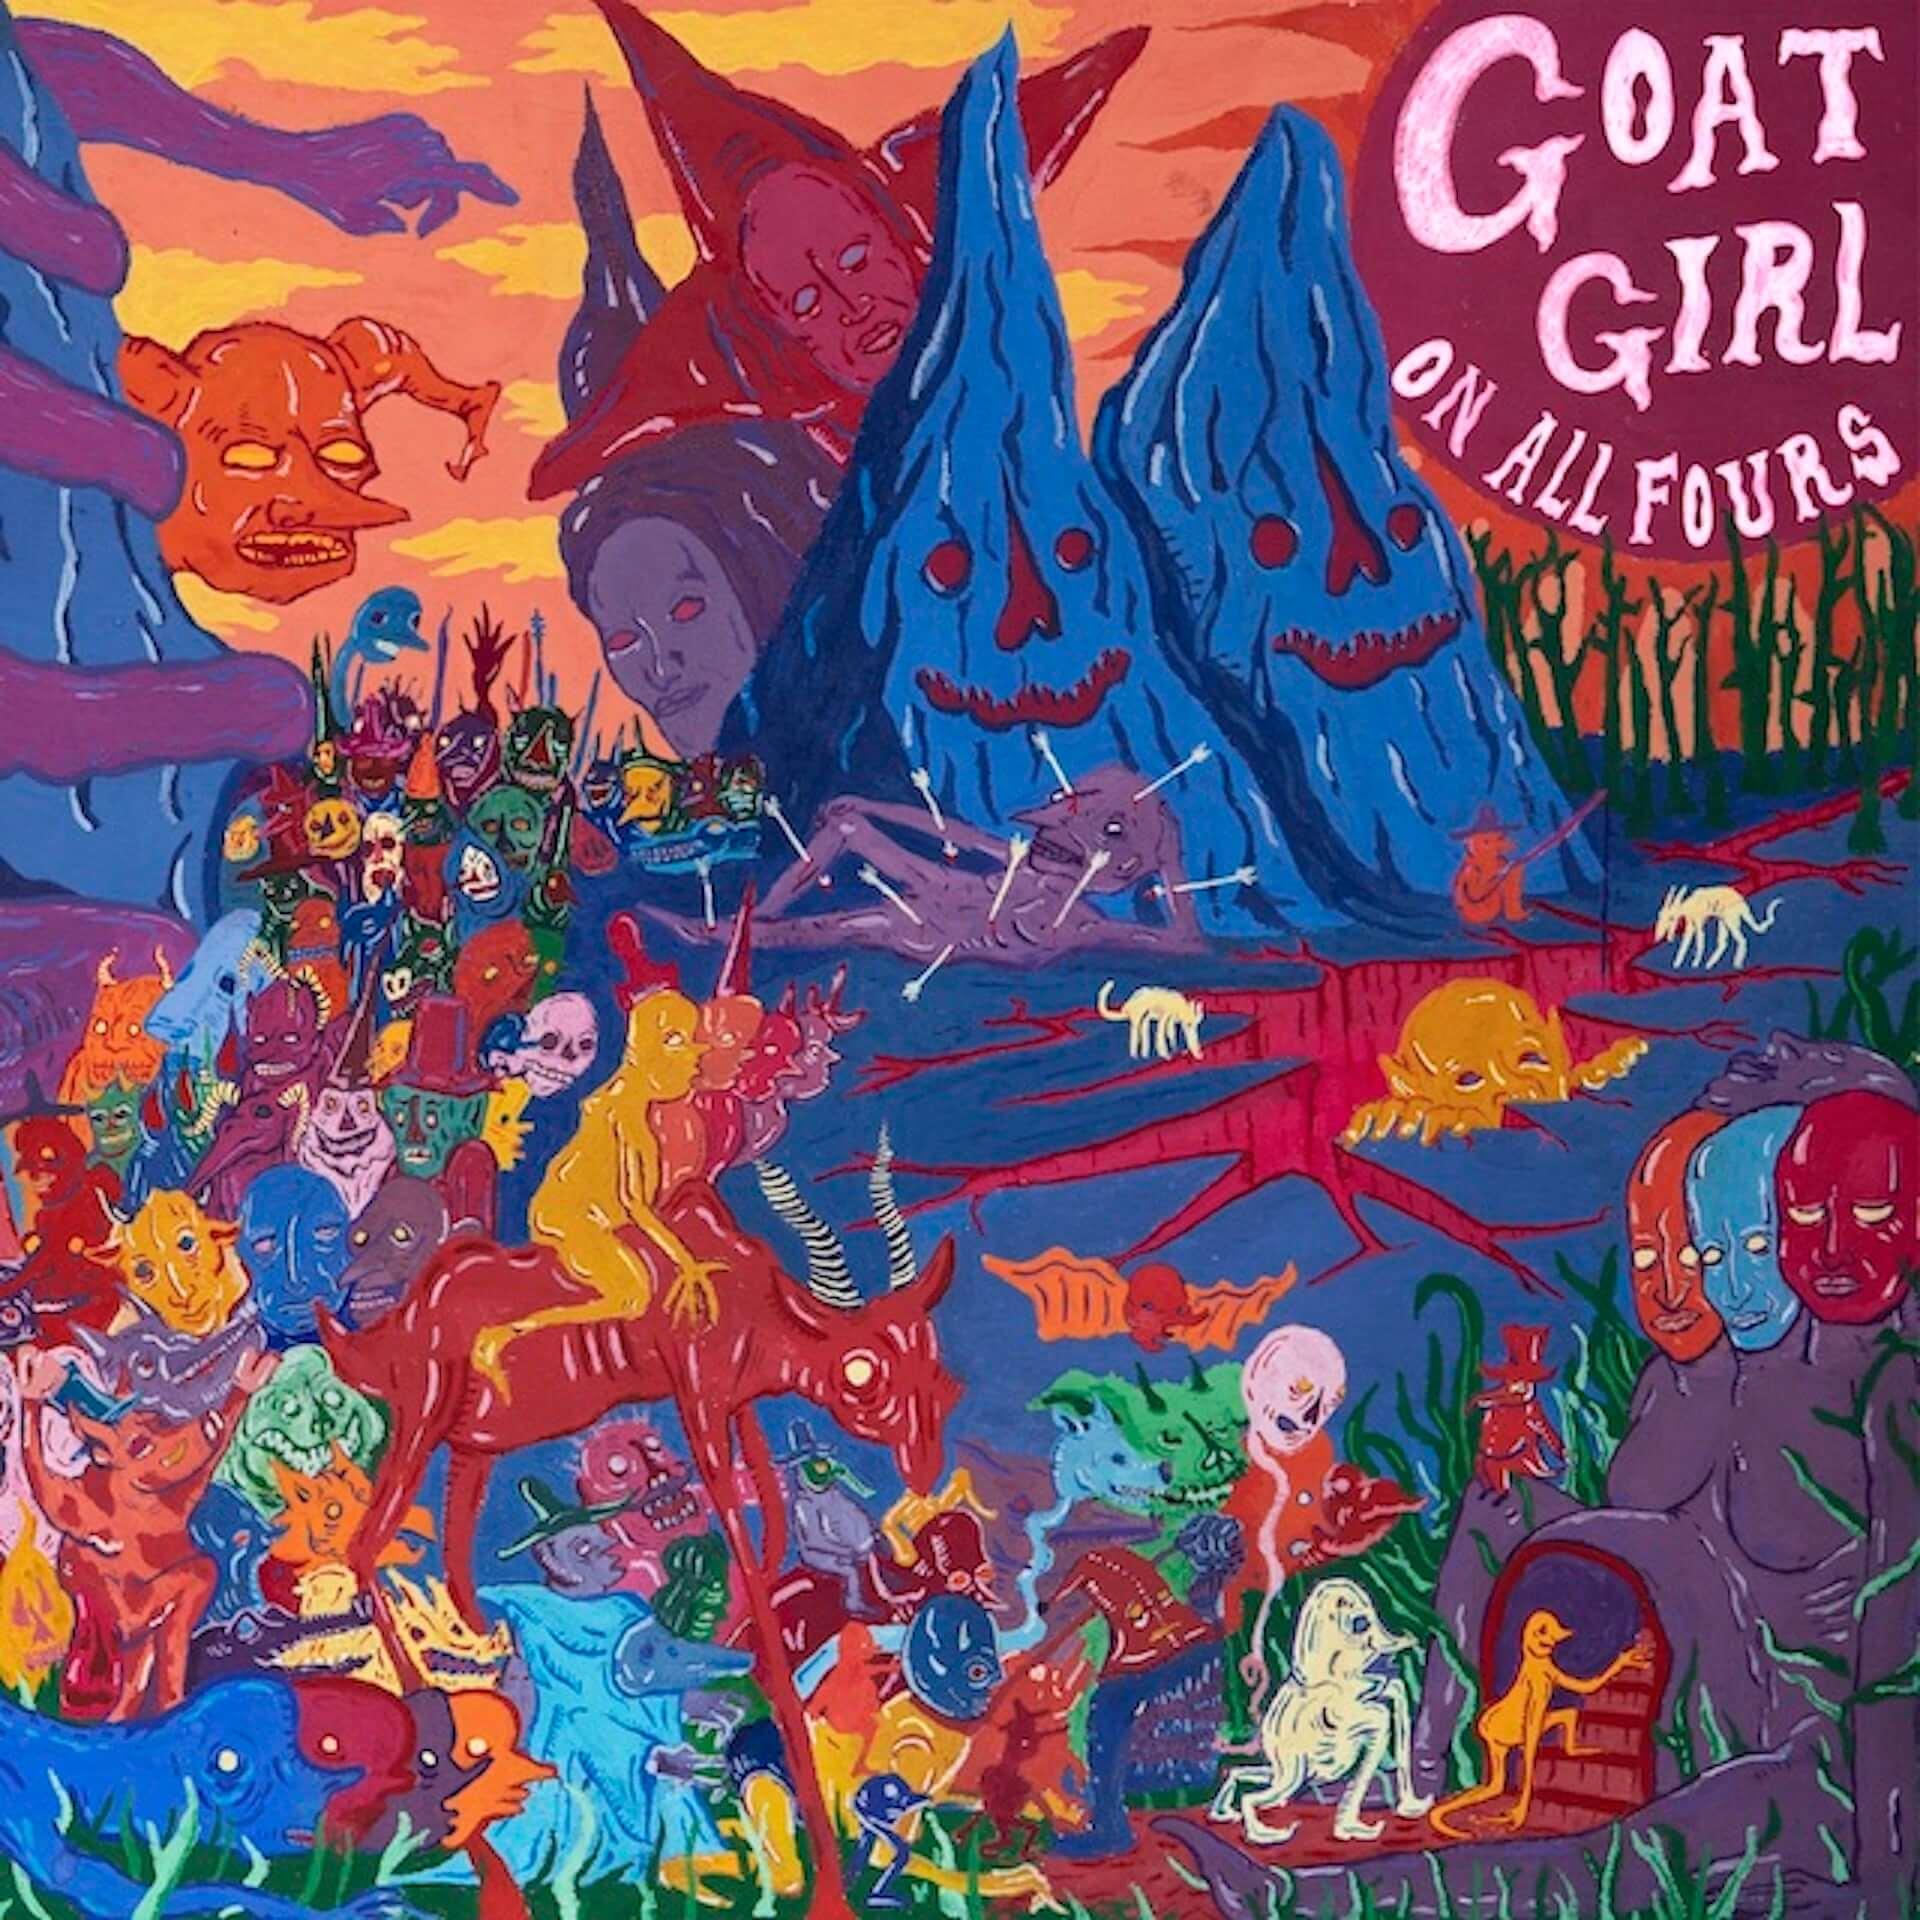 "Goat Girlの最新アルバム『On All Fours』がCD&アナログ盤で発売決定!新曲""Sad Cowboy""のMVも公開 music200929_goatgirl_3-1920x1920"